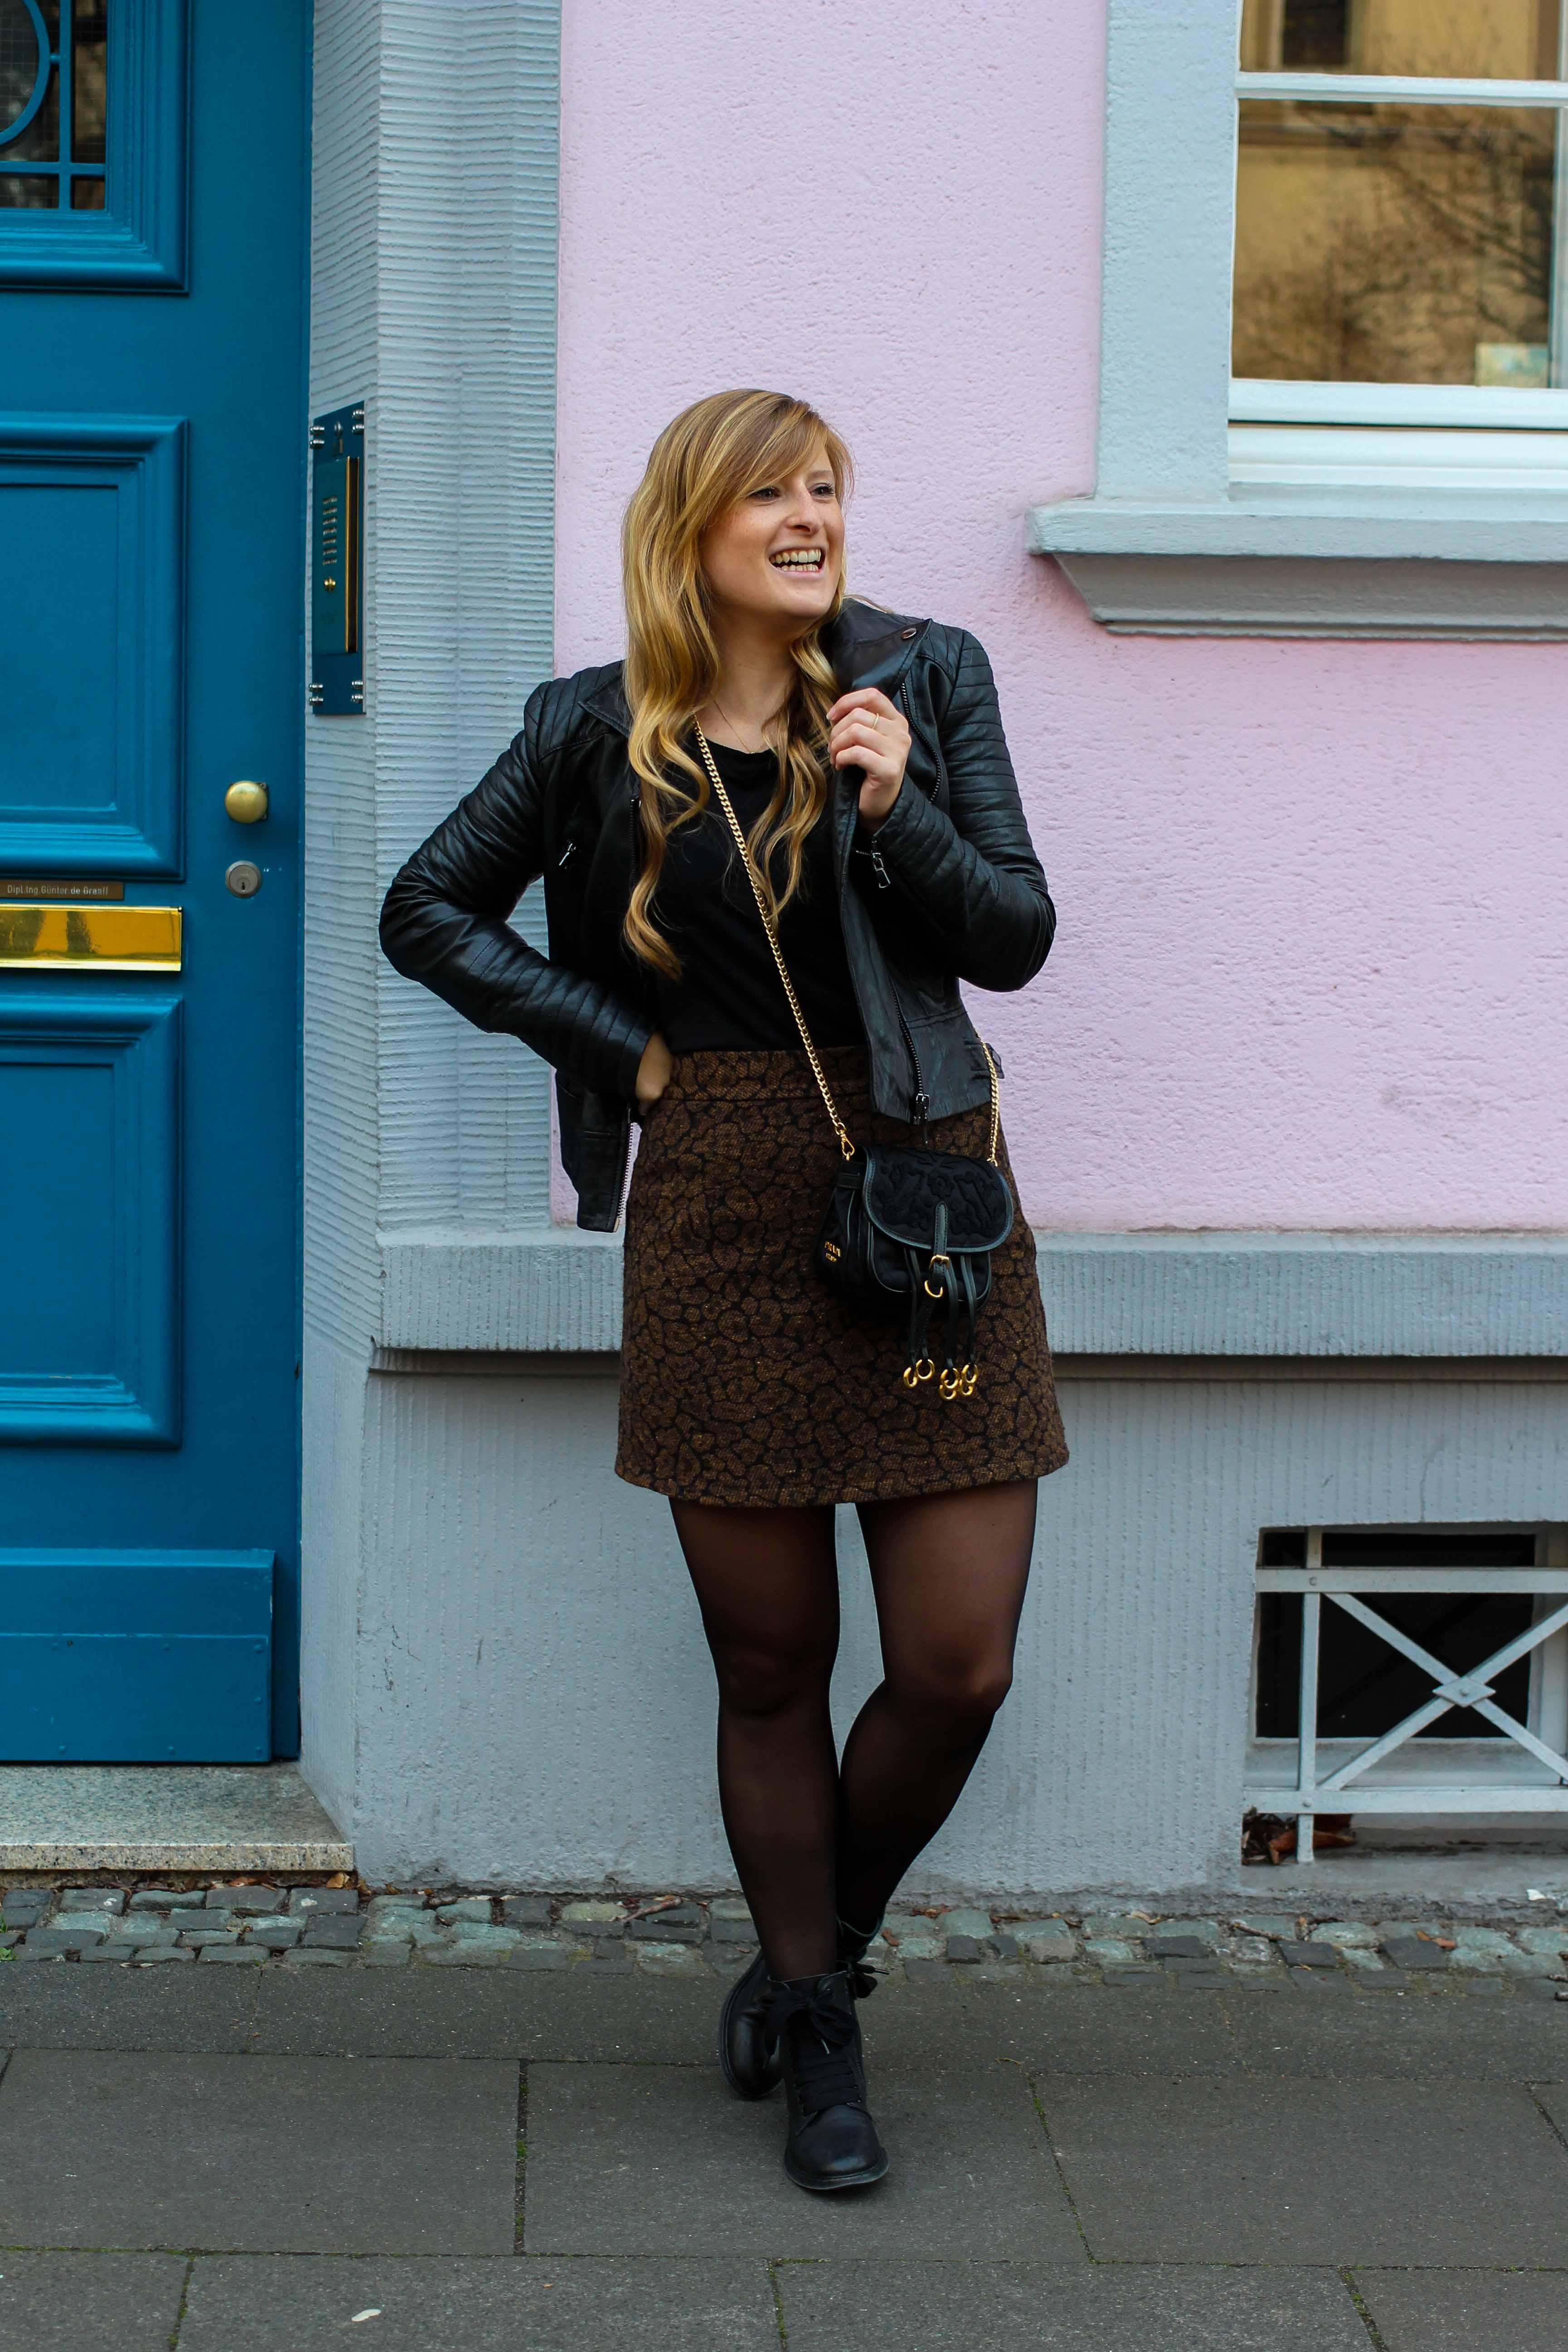 Leo Rock kombinieren Alltag Lederjacke Streetstyle Modeblog Prada Handtasche Stoff Edited Boots Frühling Strumpfhose 5